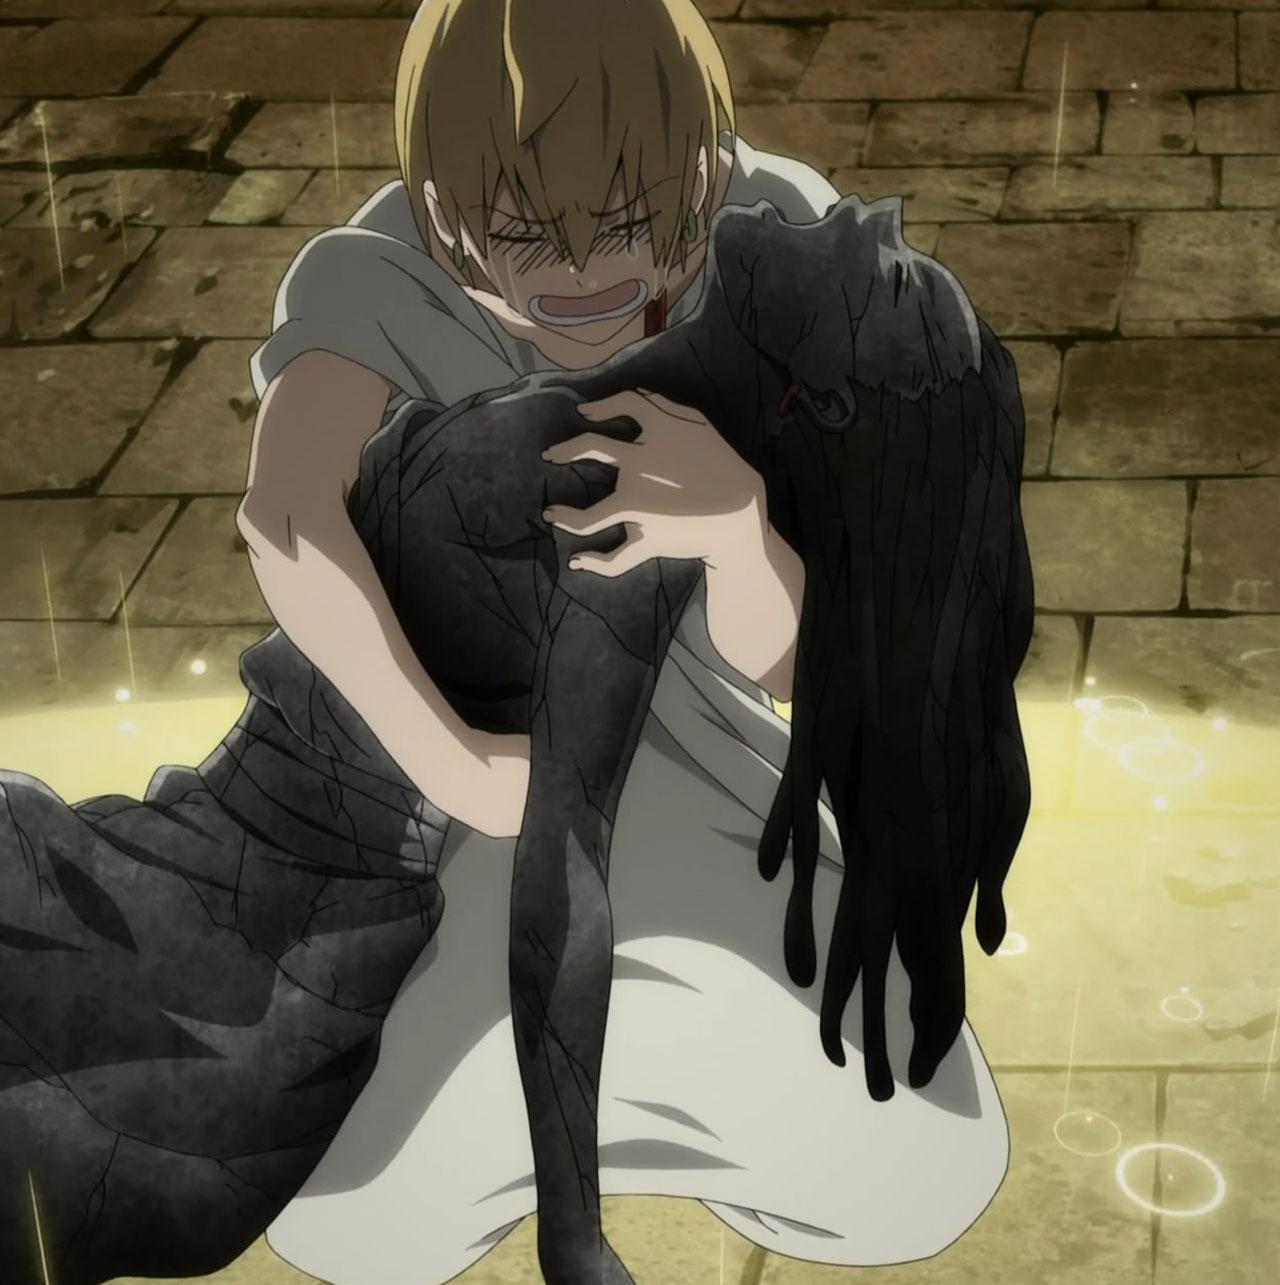 Anime Batch Action: ANIME MONDAY 7/22/13